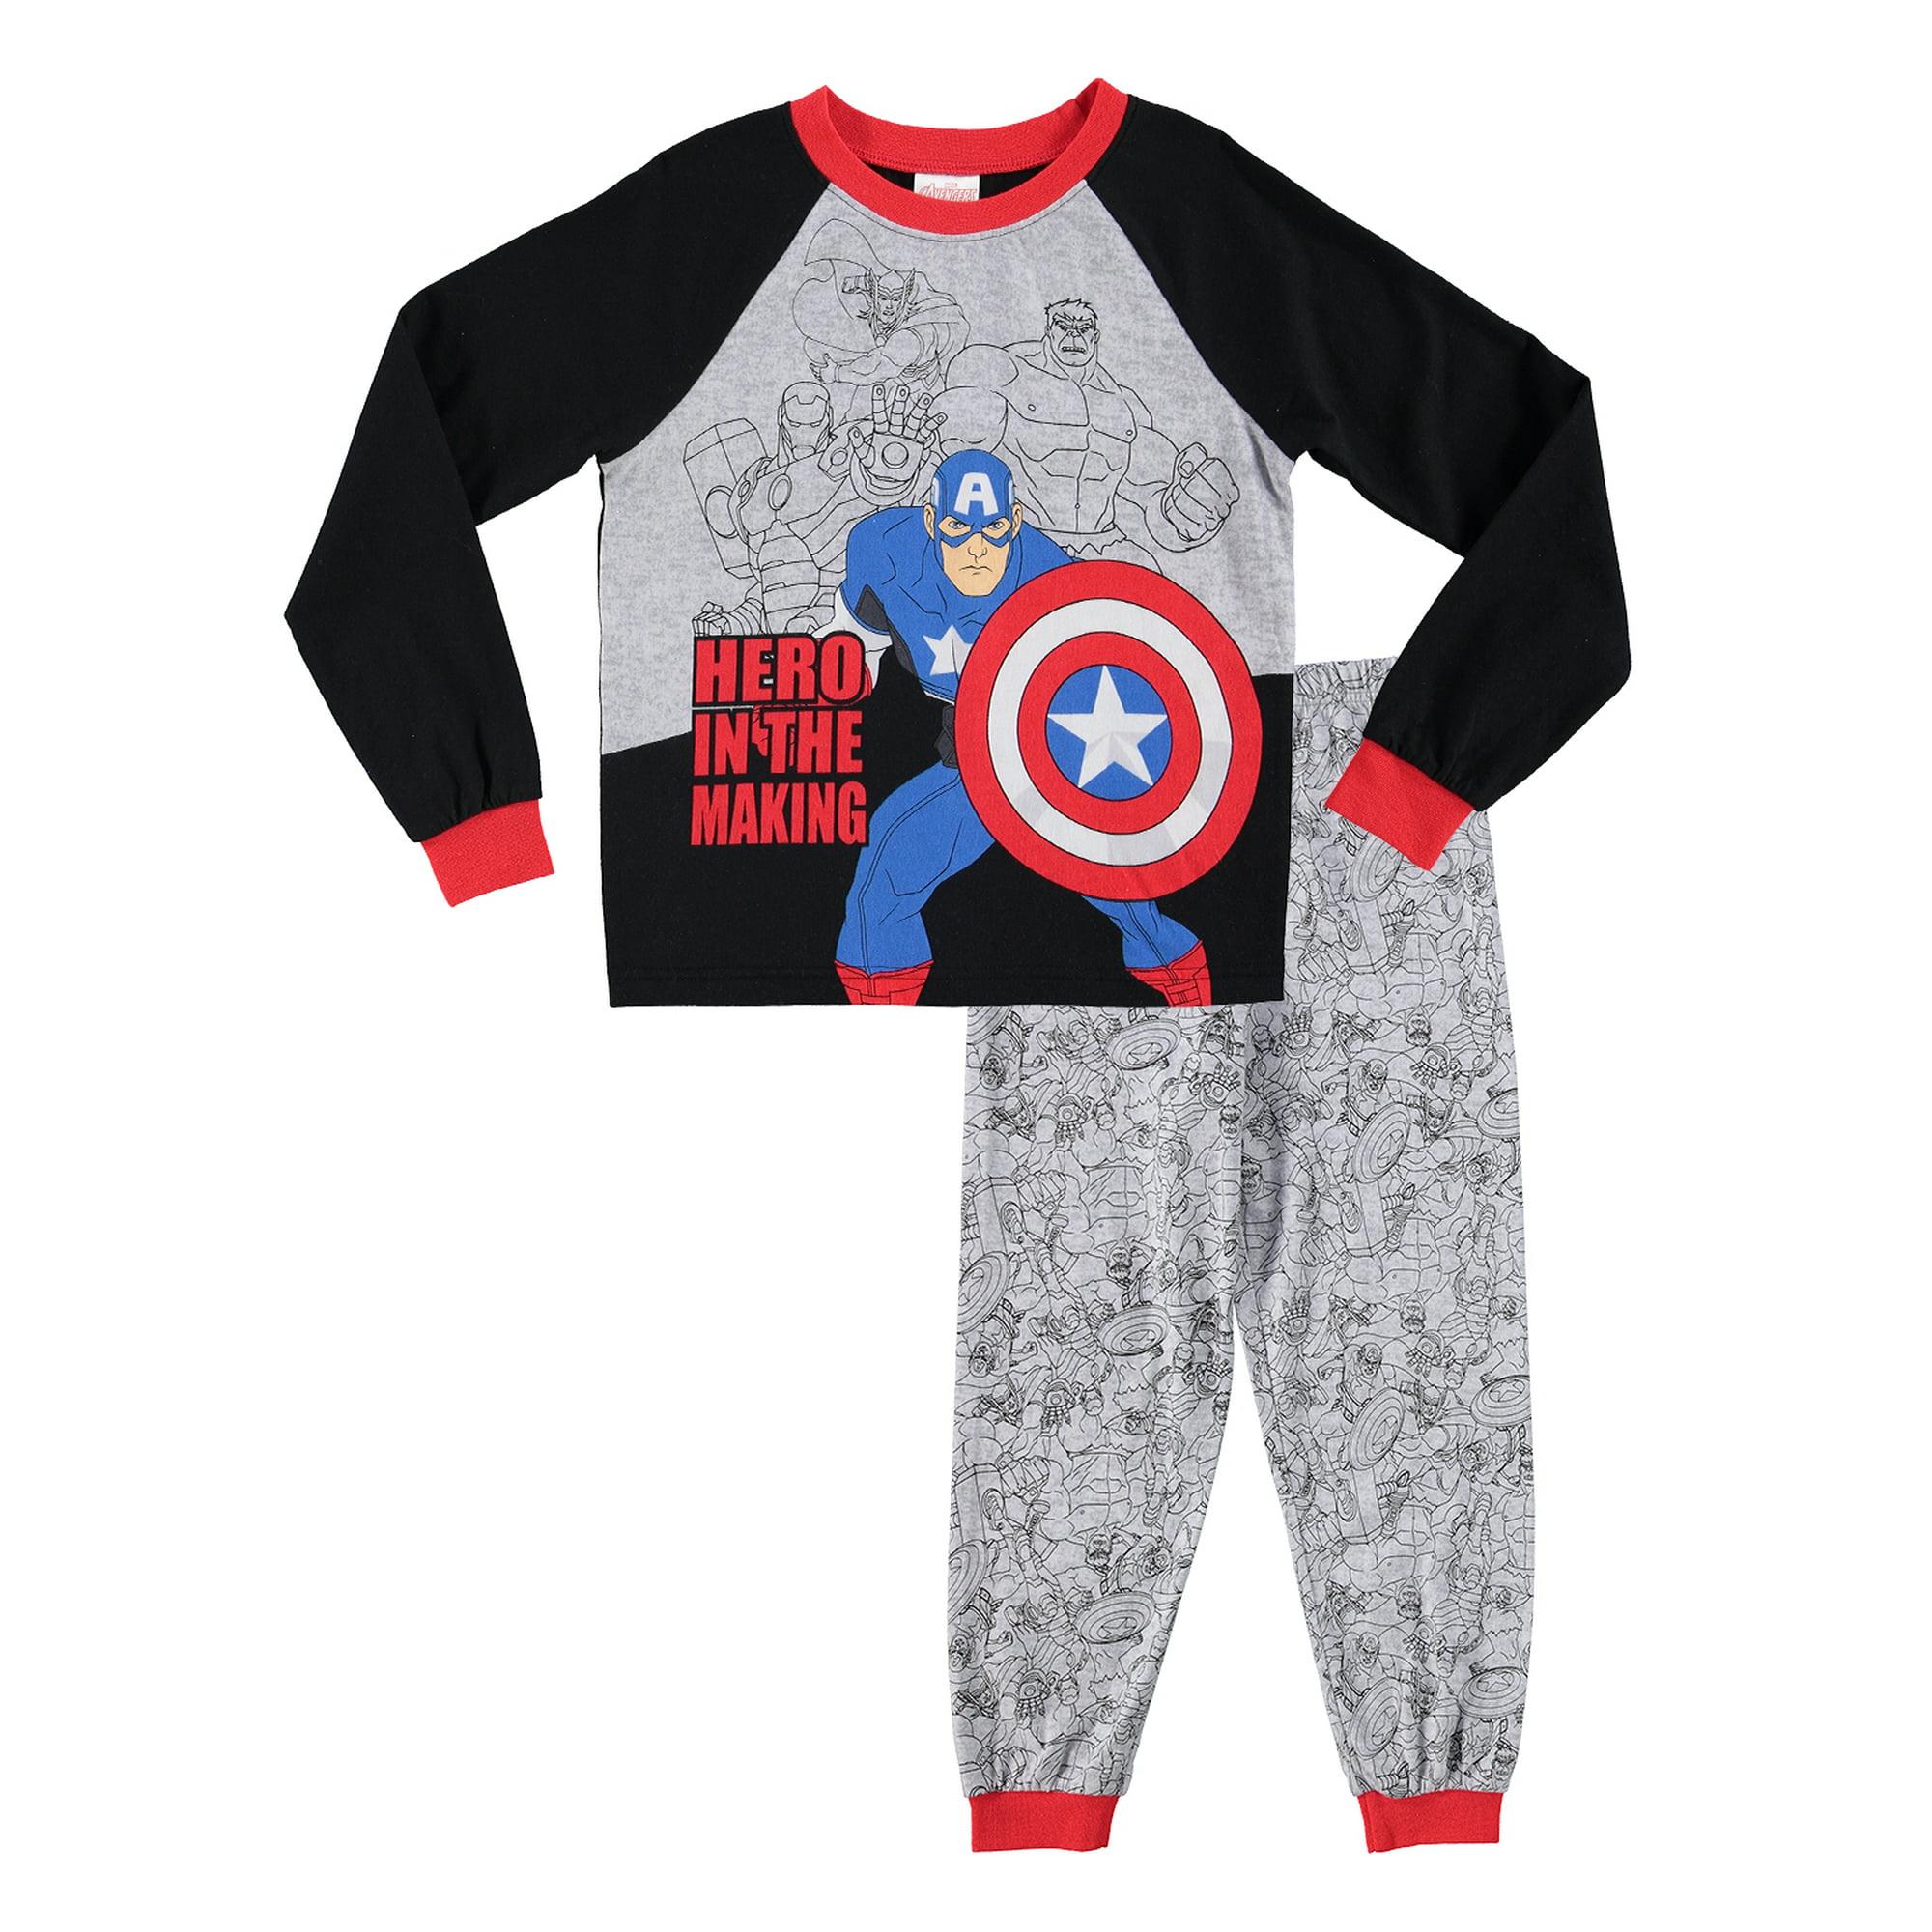 107610d9 Avengers Boys Sleepwear | Cotton Kids 2-Piece Pajama Set - 6